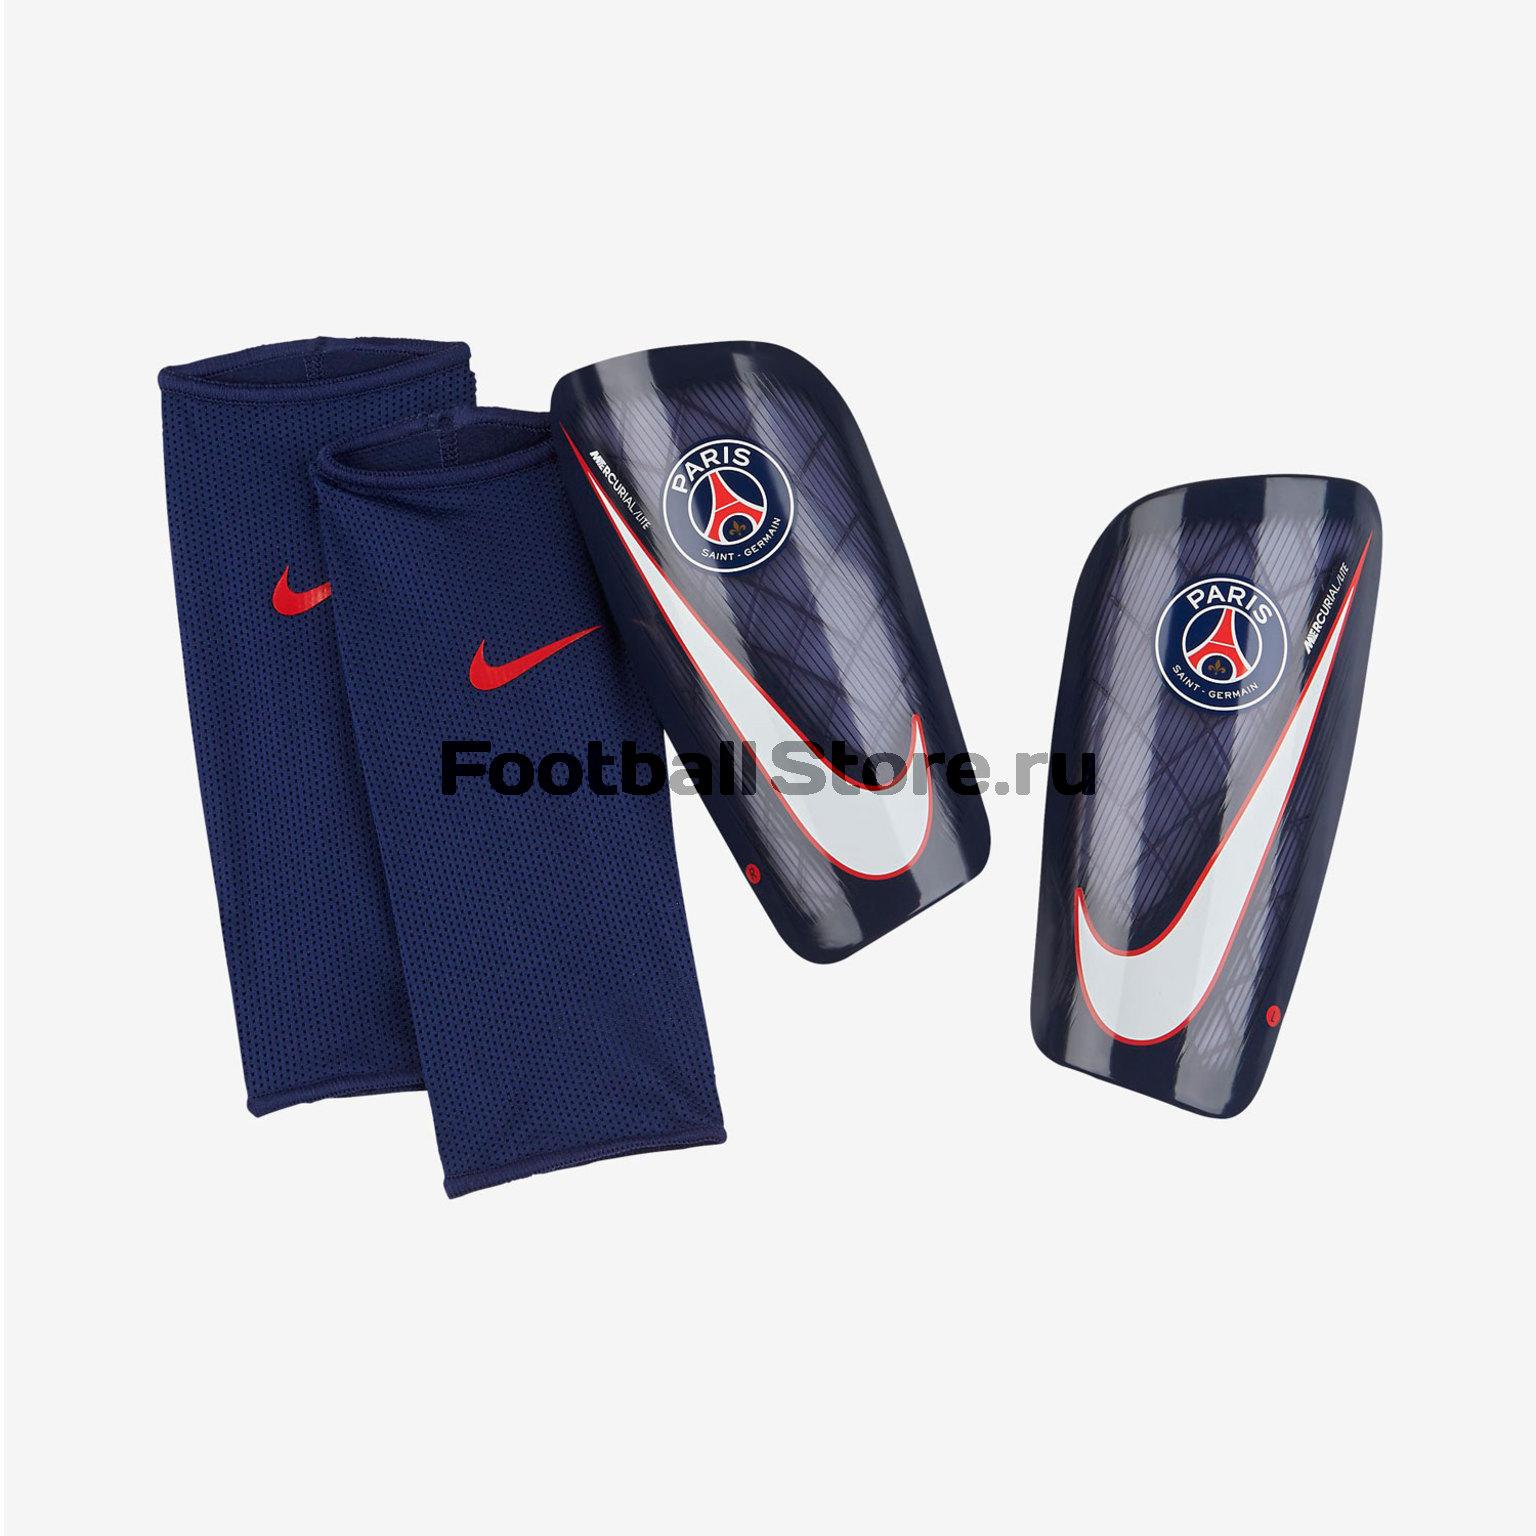 Щитки Nike PSG NK Mercurial Lite SP2113-488 psg nike гетры nike psg stadium sx6033 429